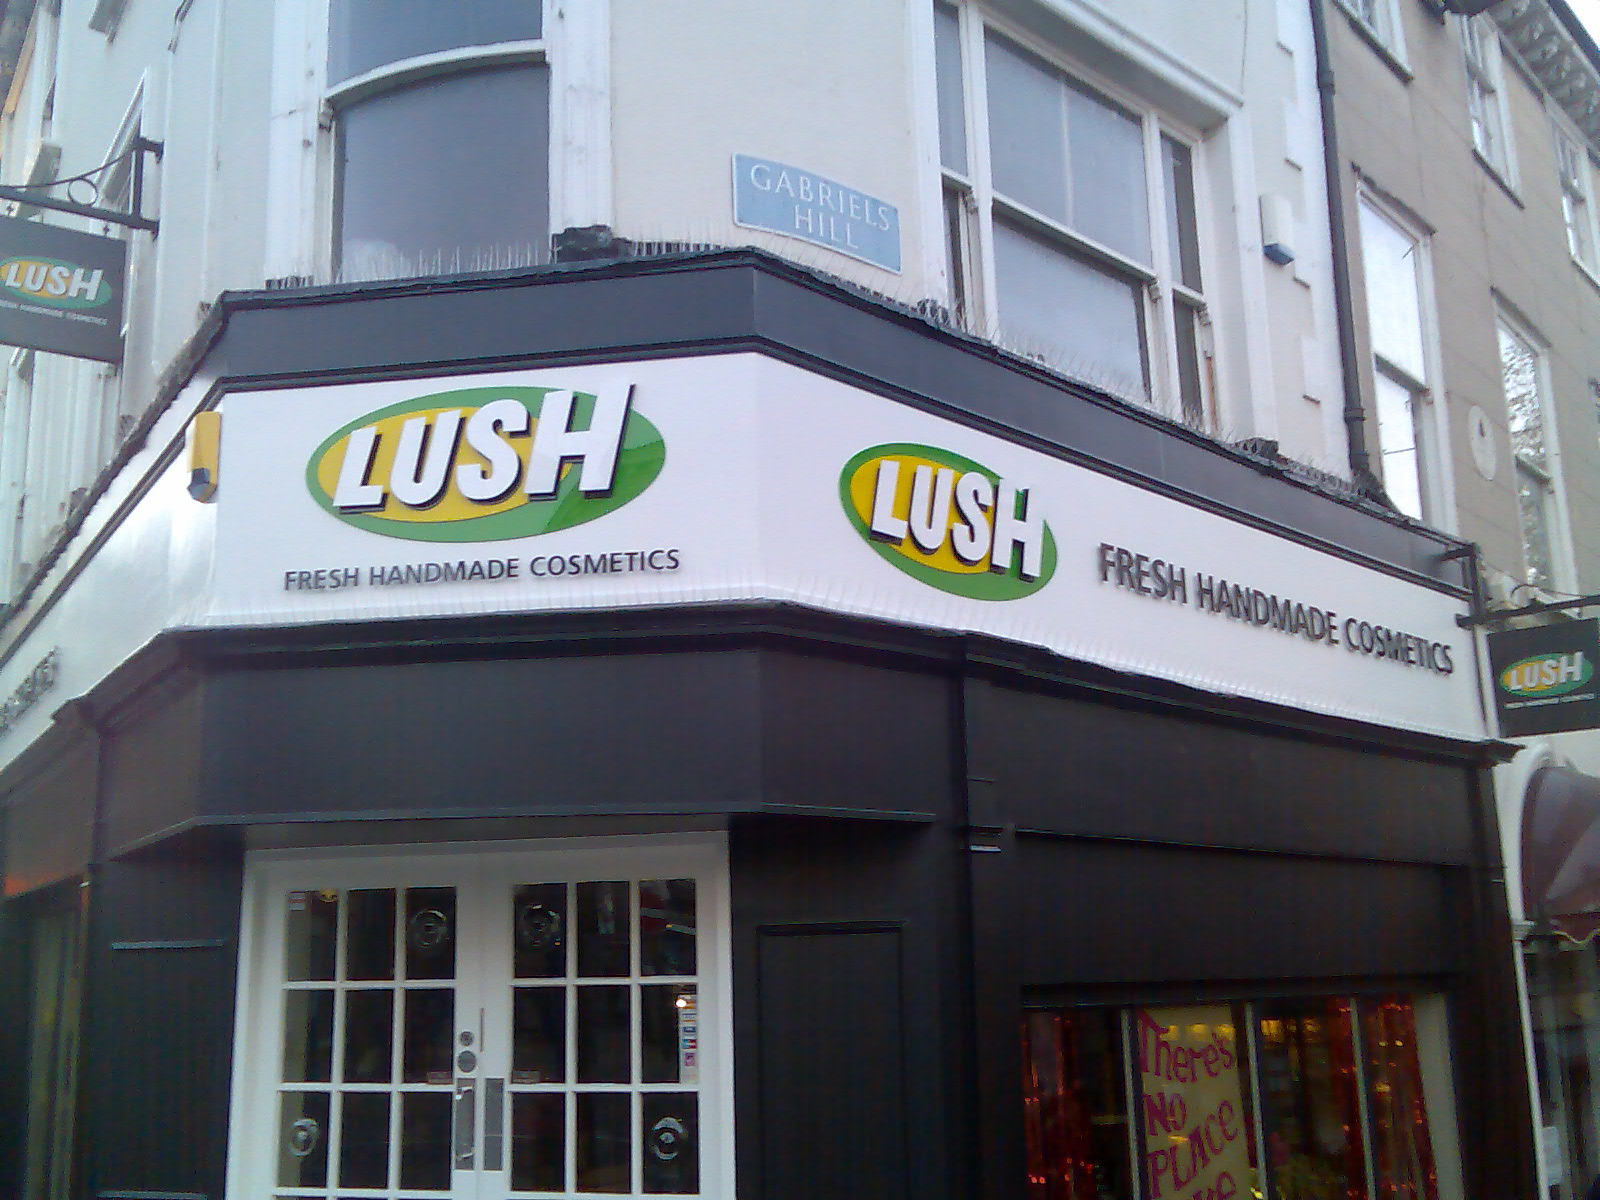 lush (1)